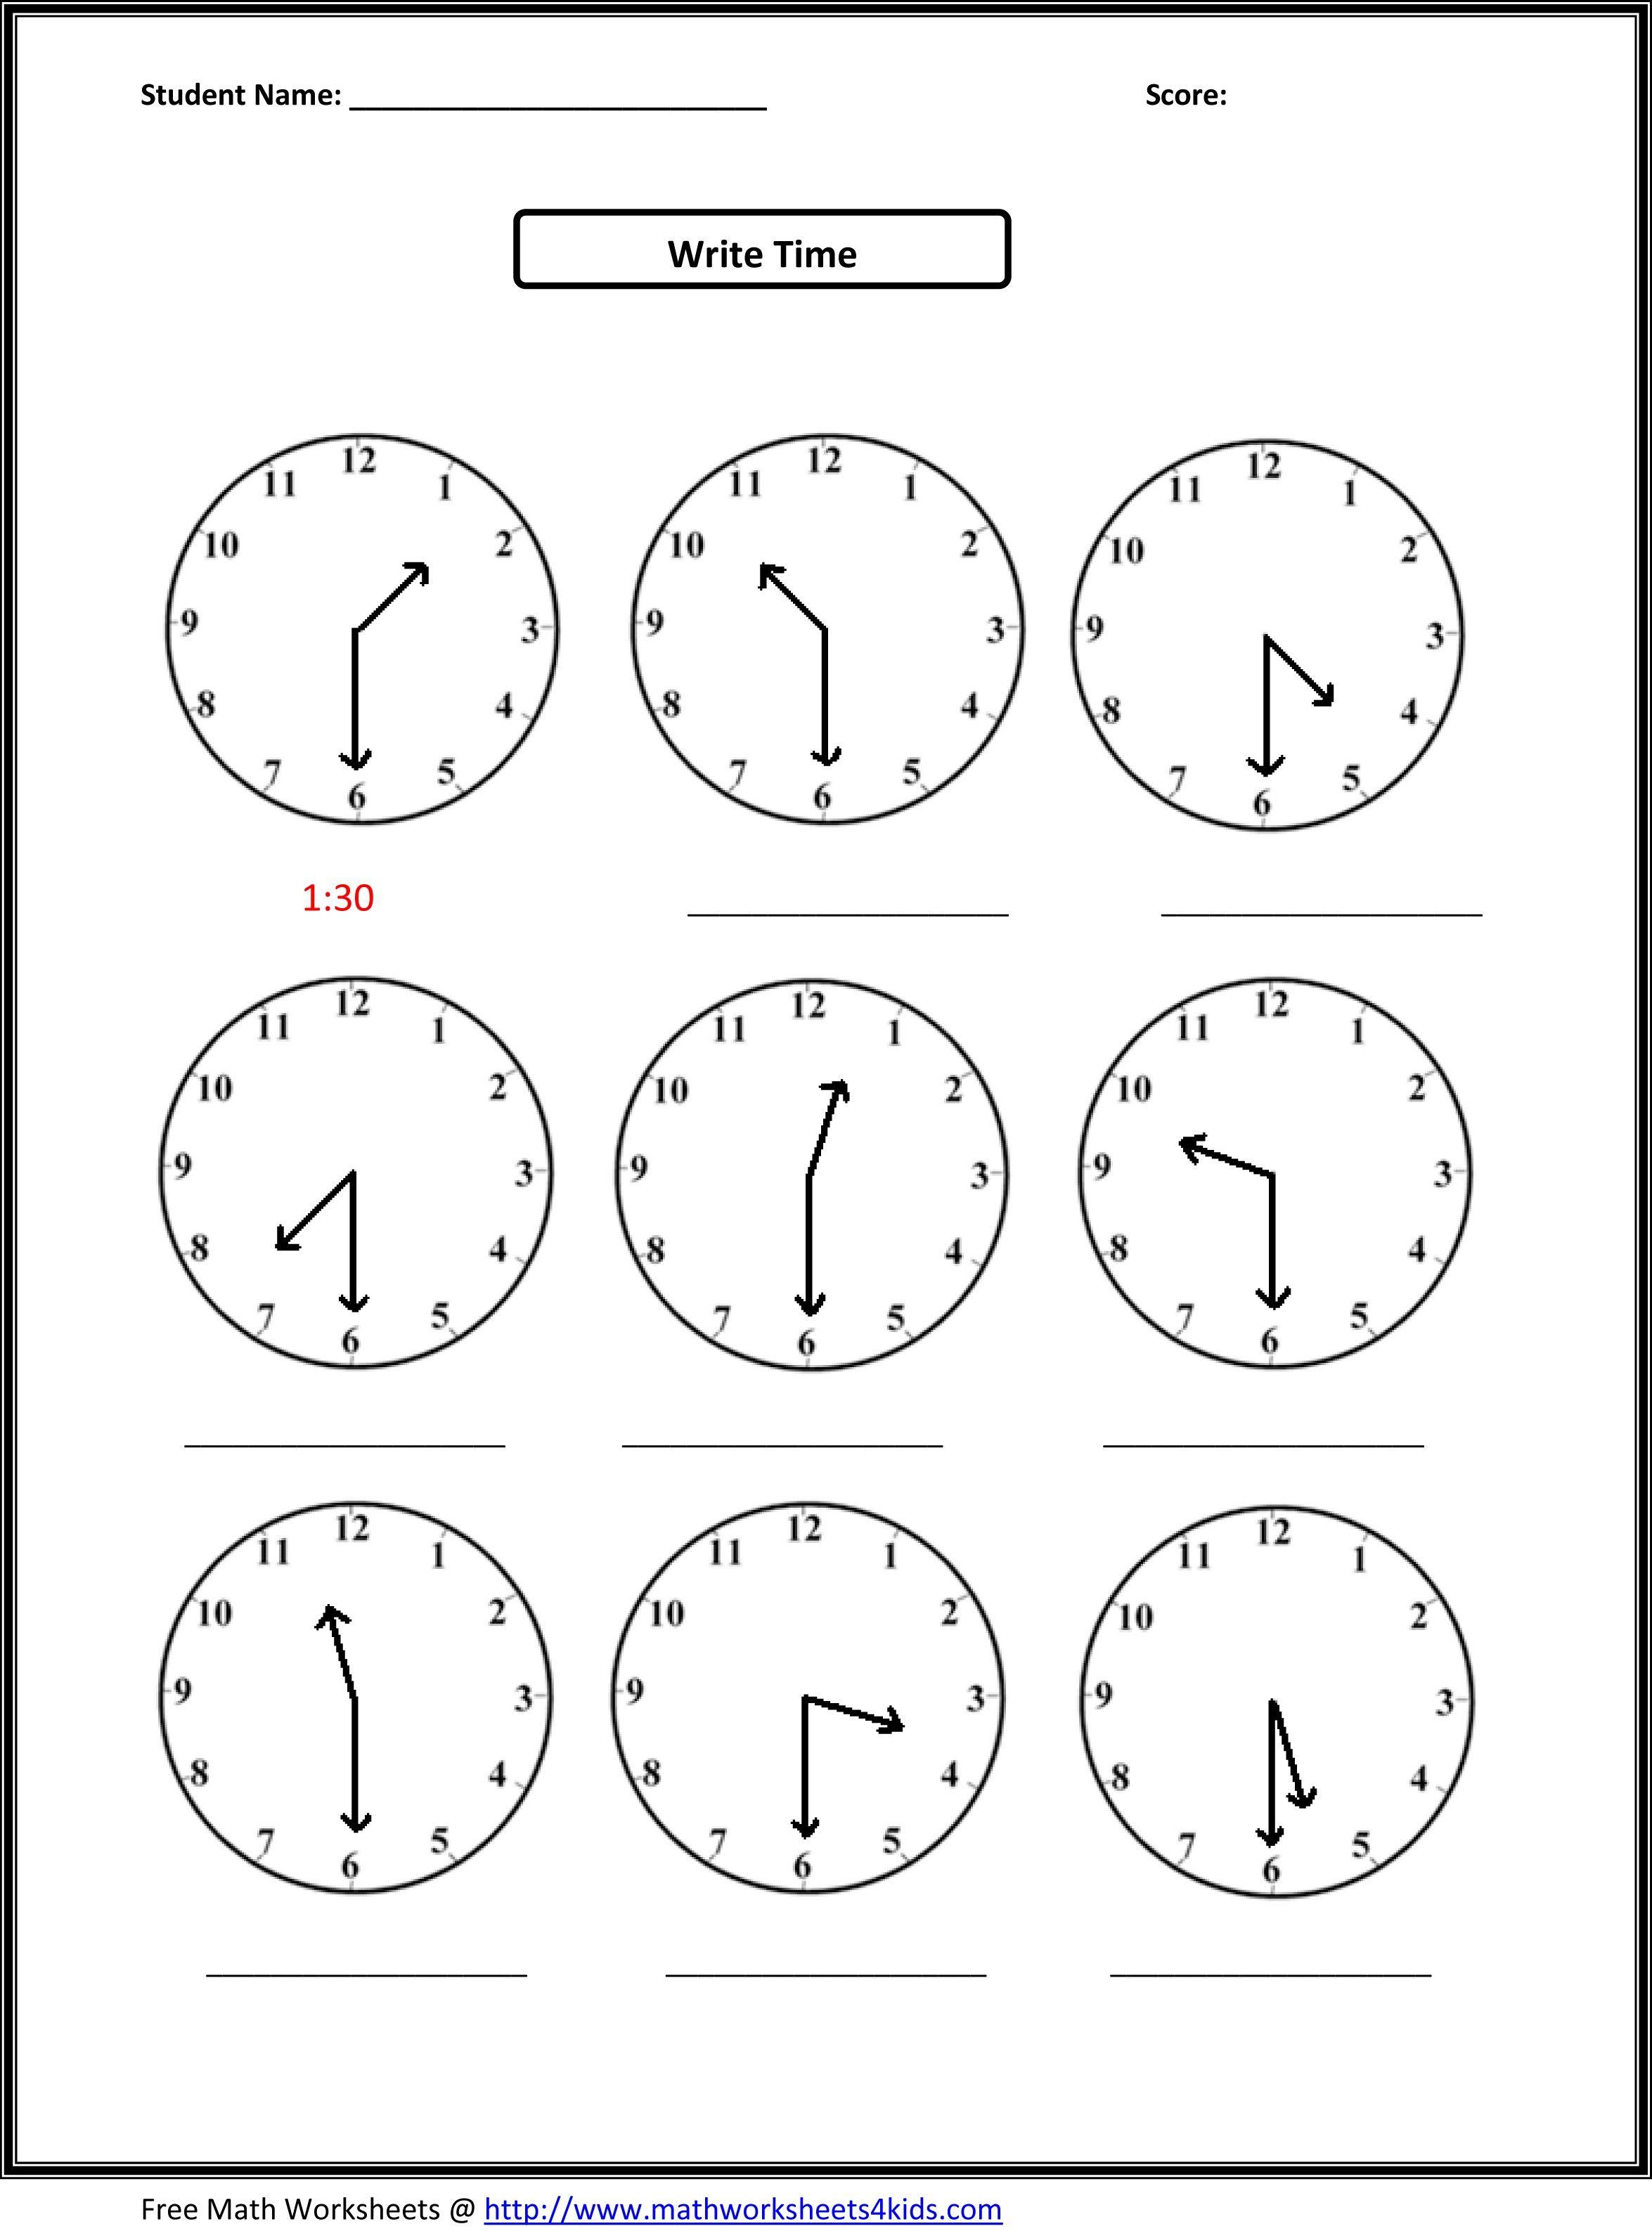 2Nd Grade Free Worksheets Math   Math: Time/measurement   2Nd Grade   Go Math Printable Worksheets